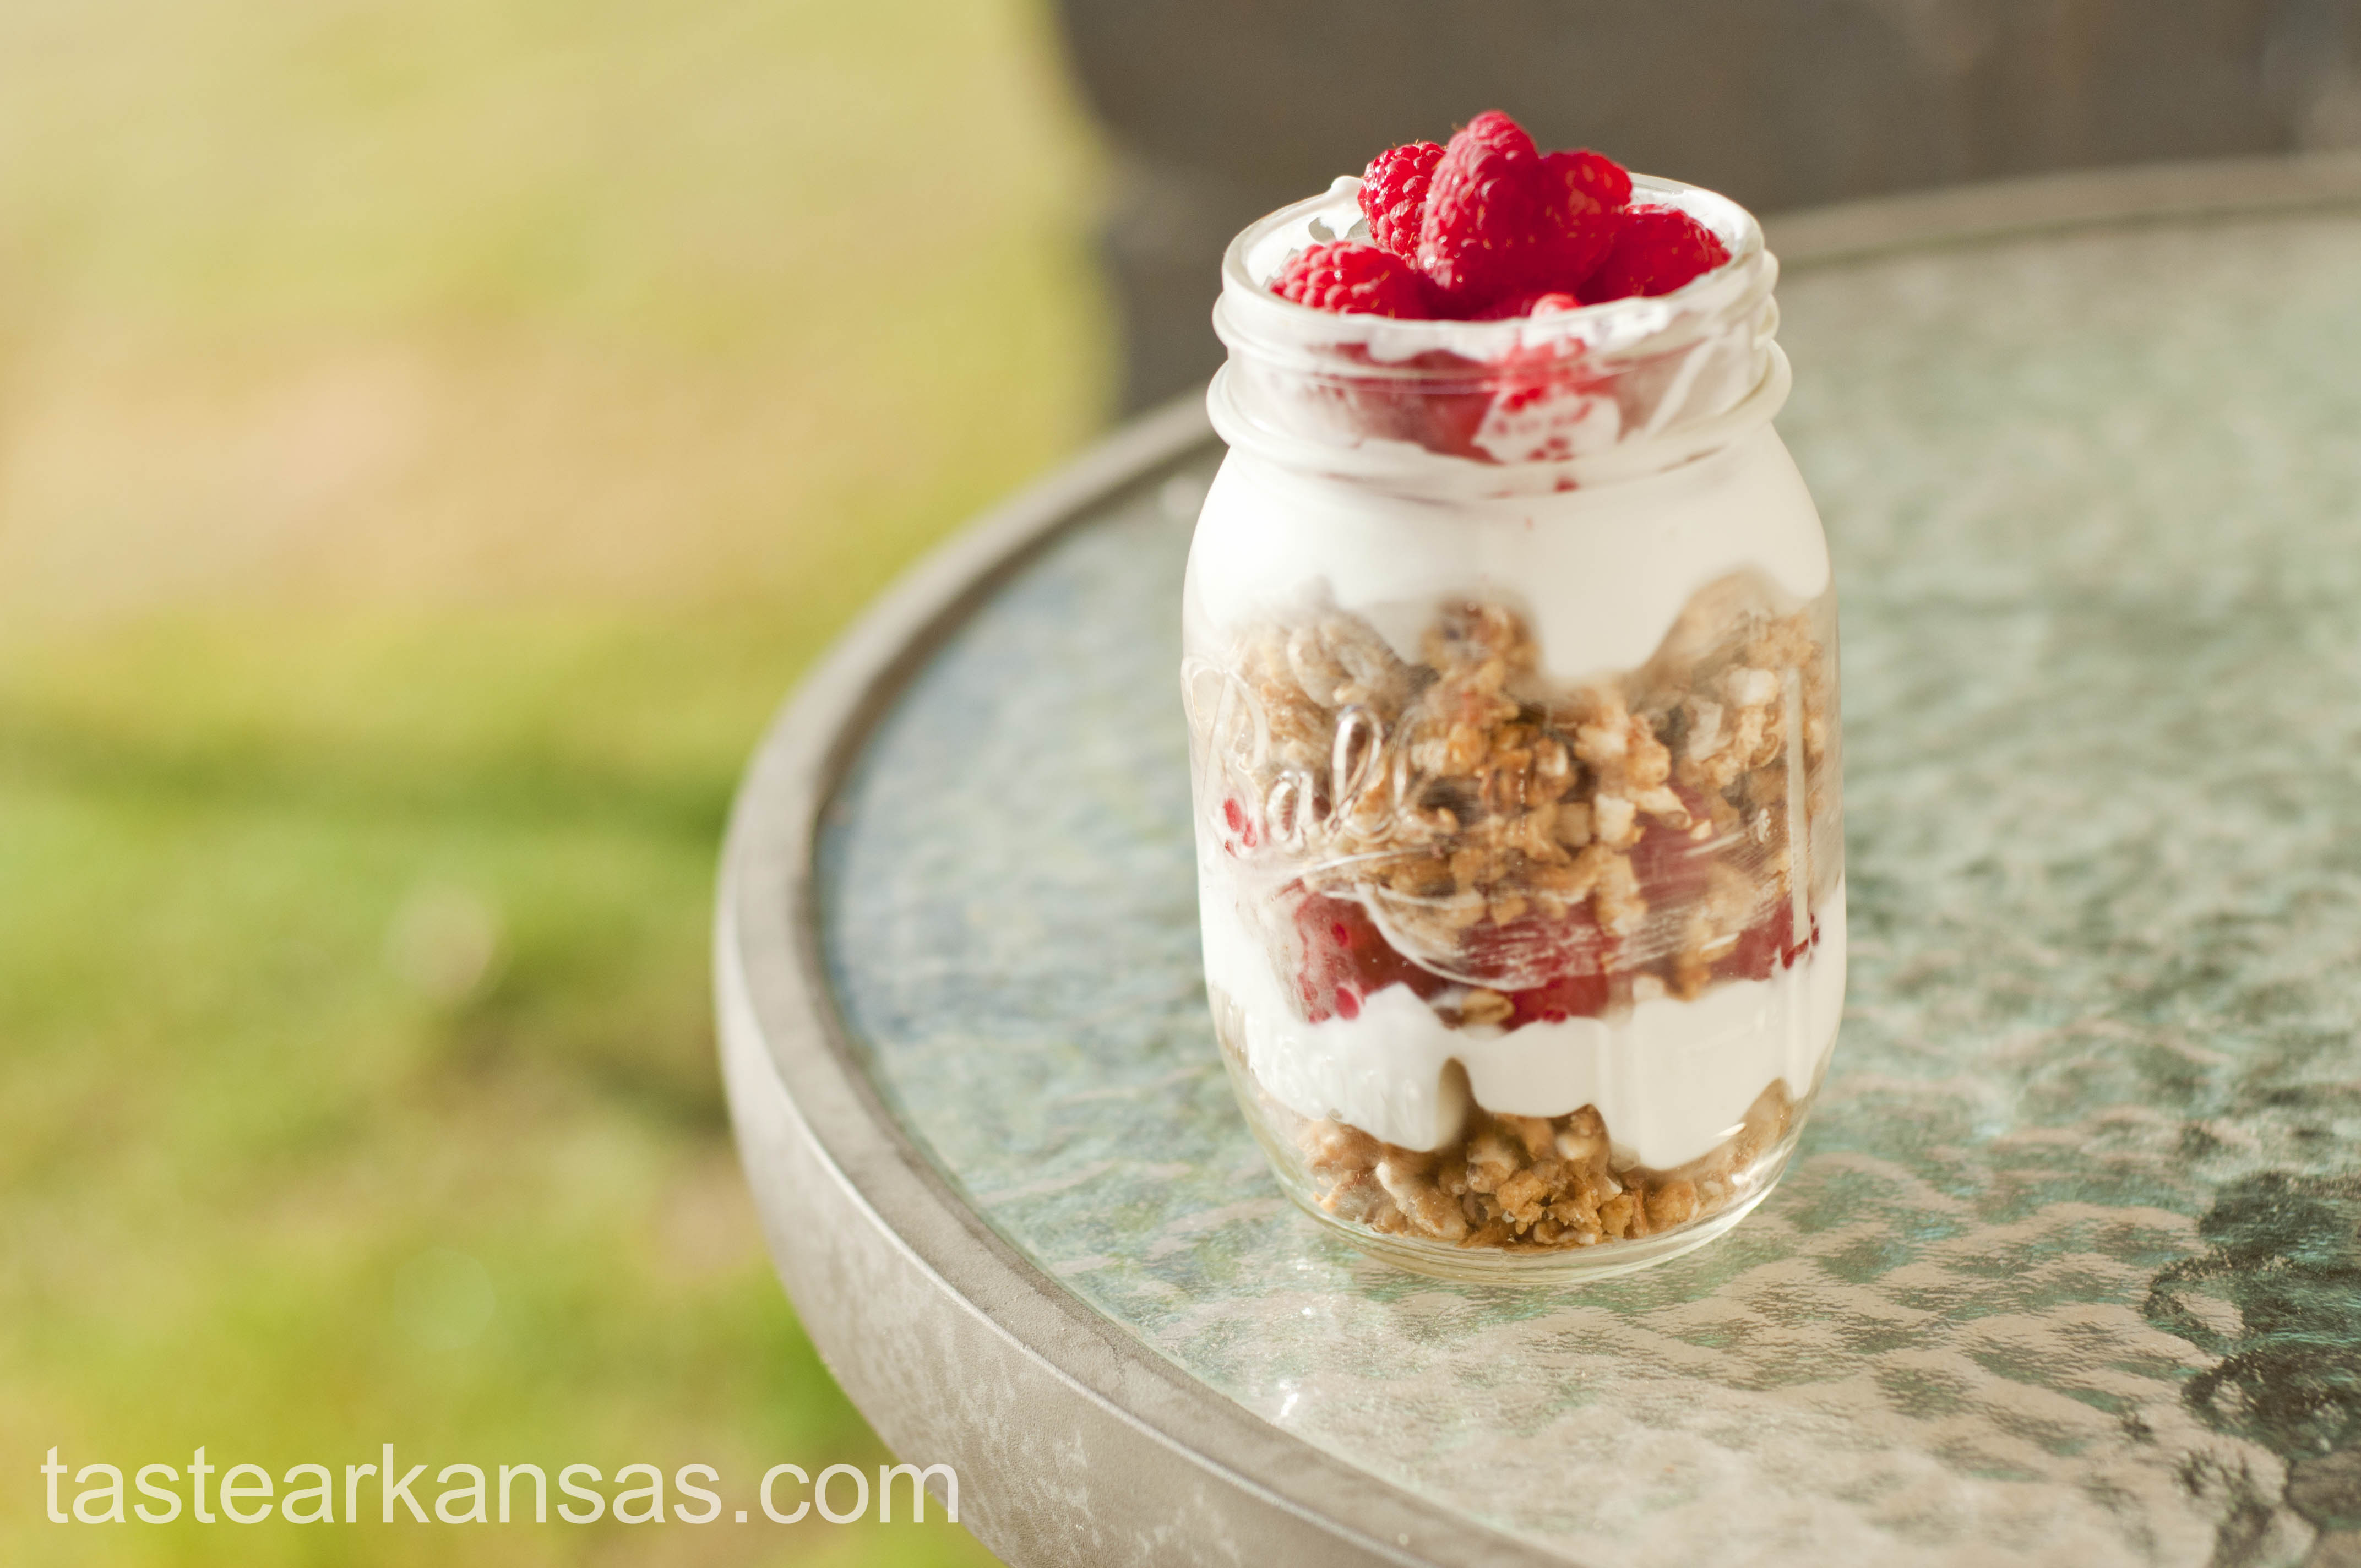 raspberry parfaits, raspberry yogurt parfait, summer snack, easy summer snack, cool summer snack, granola, raspberries, greek yogurt, vanilla greek yogurt